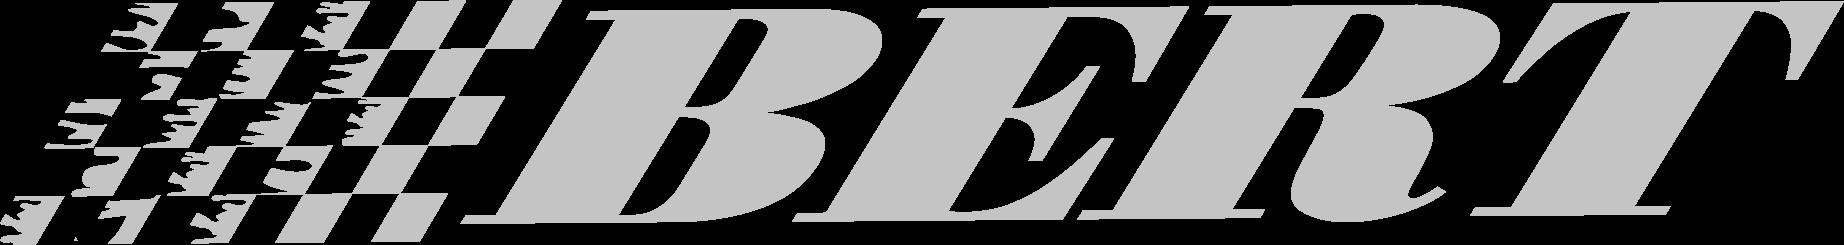 Bert Transmission